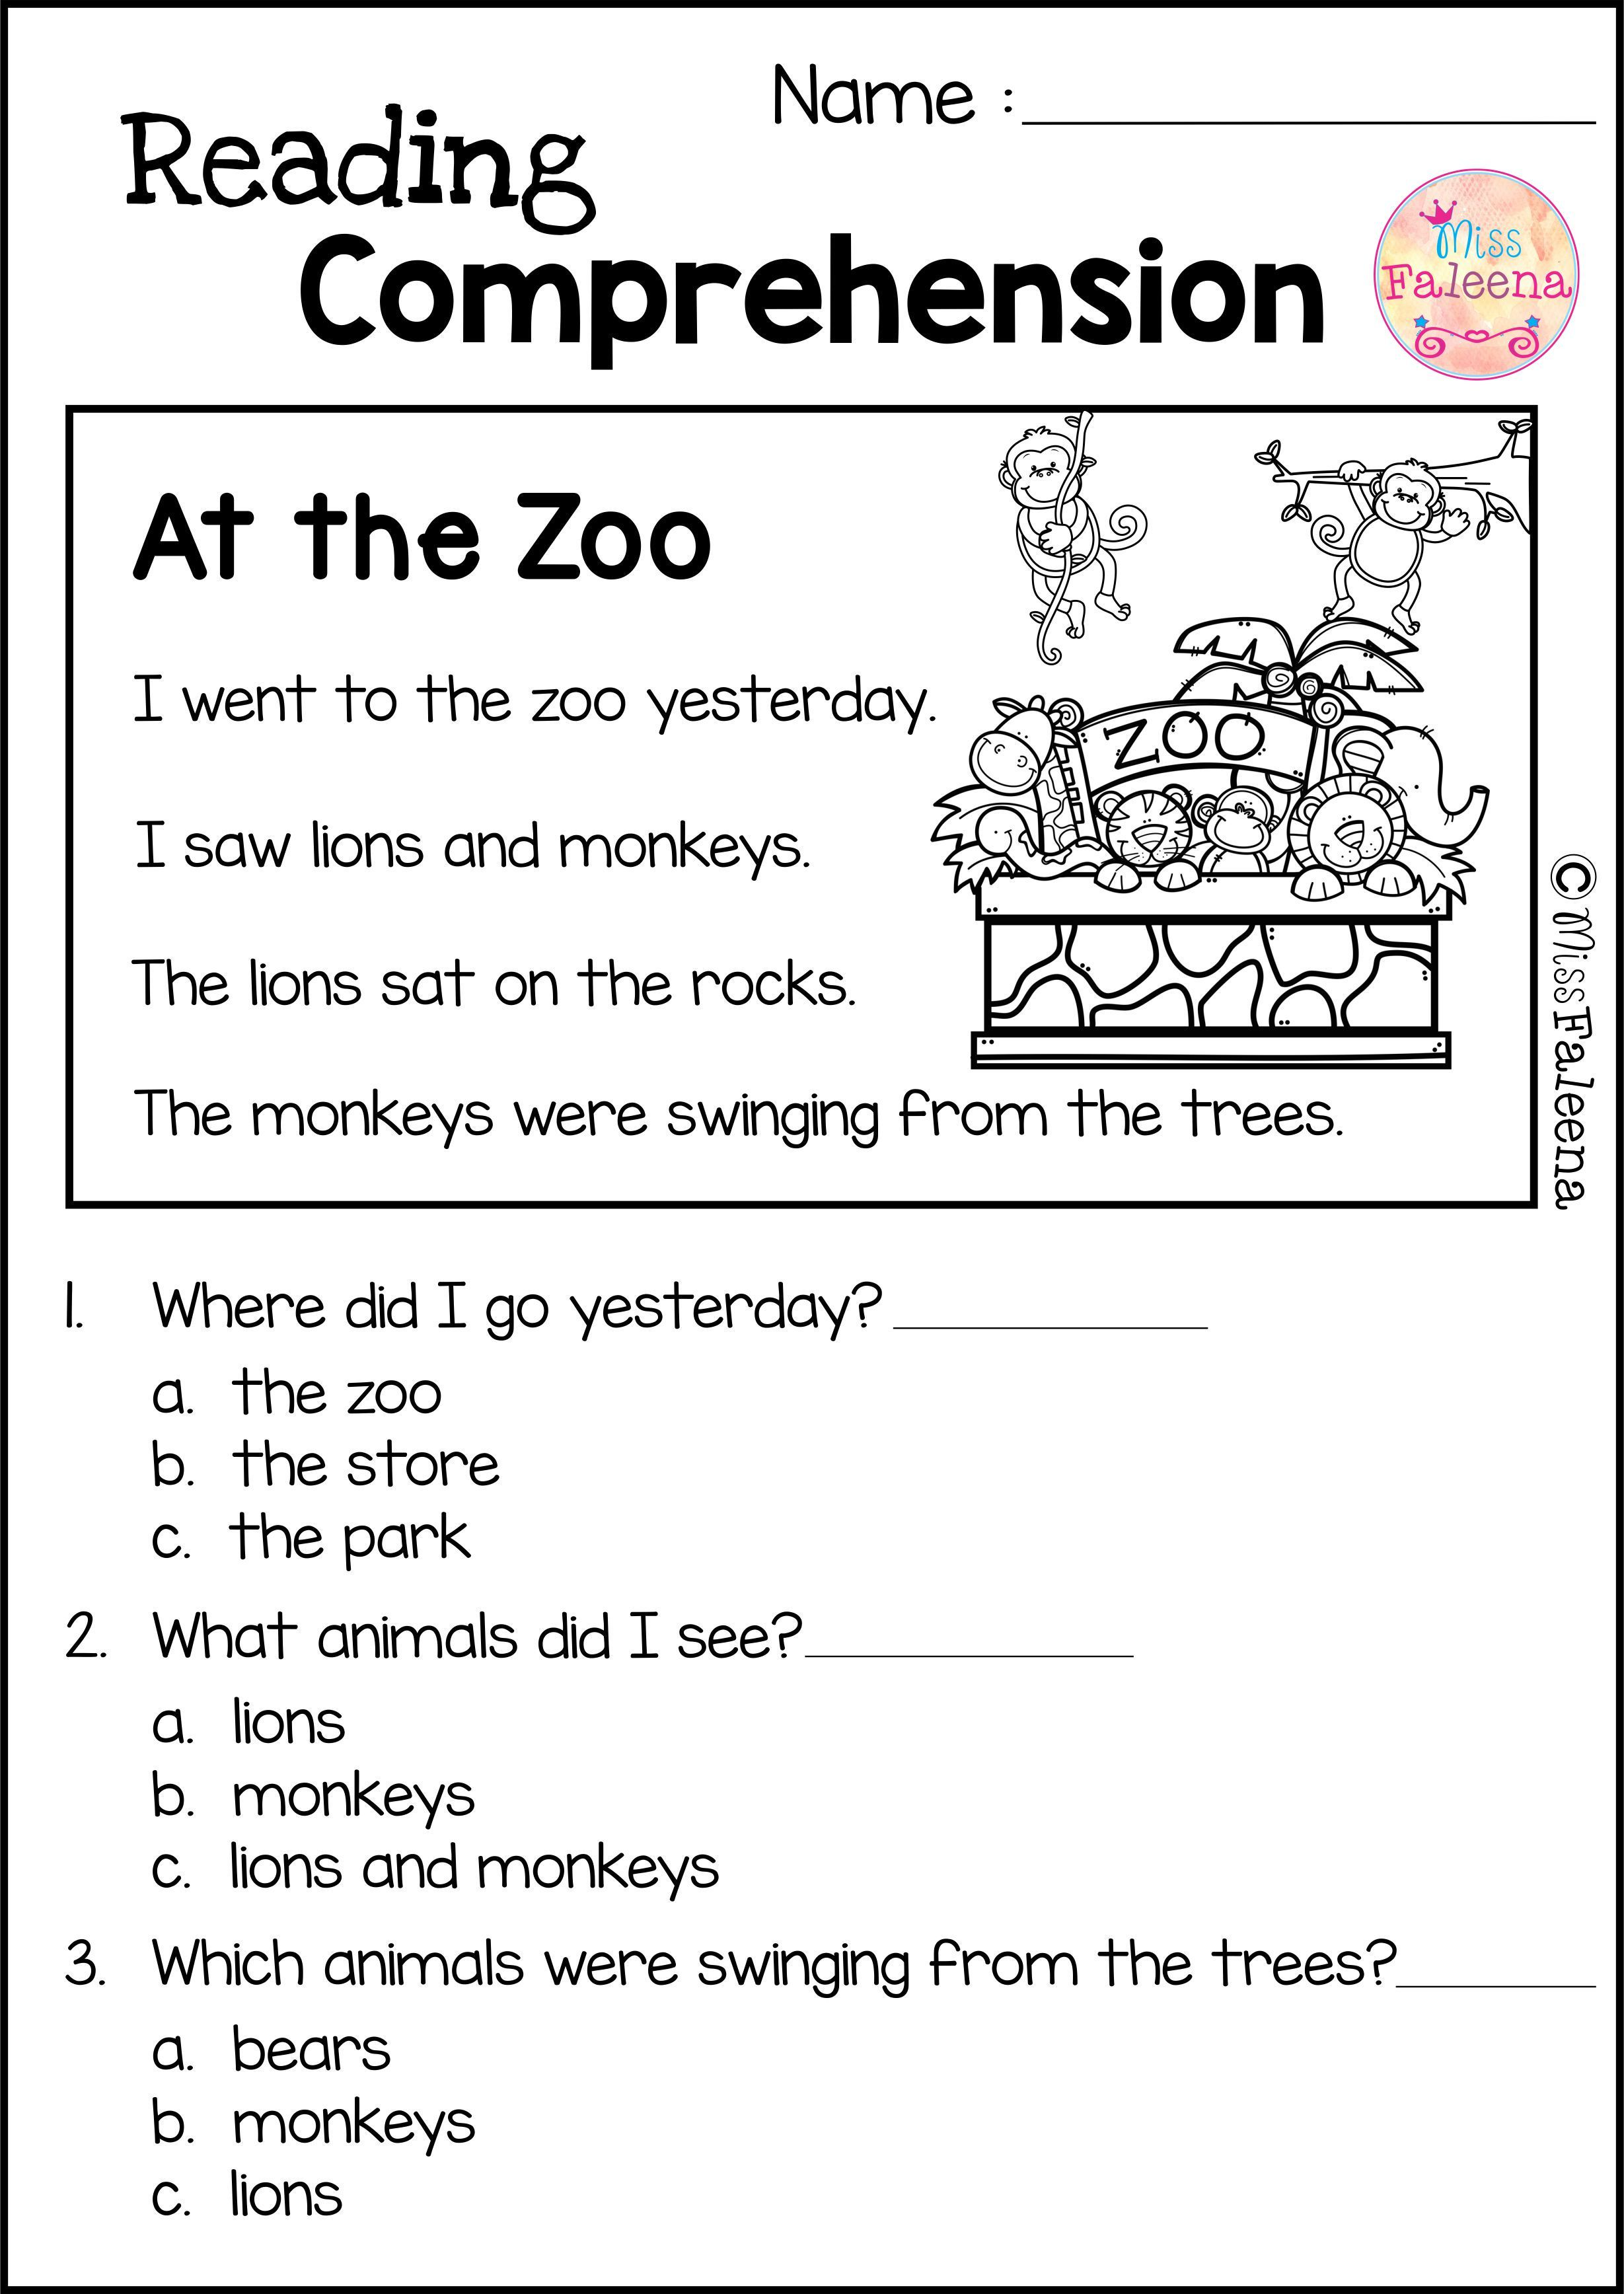 medium resolution of https://dubaikhalifas.com/english-comprehension-for-kindergarten-2-grade-1-and-2-with-free-worksheet/